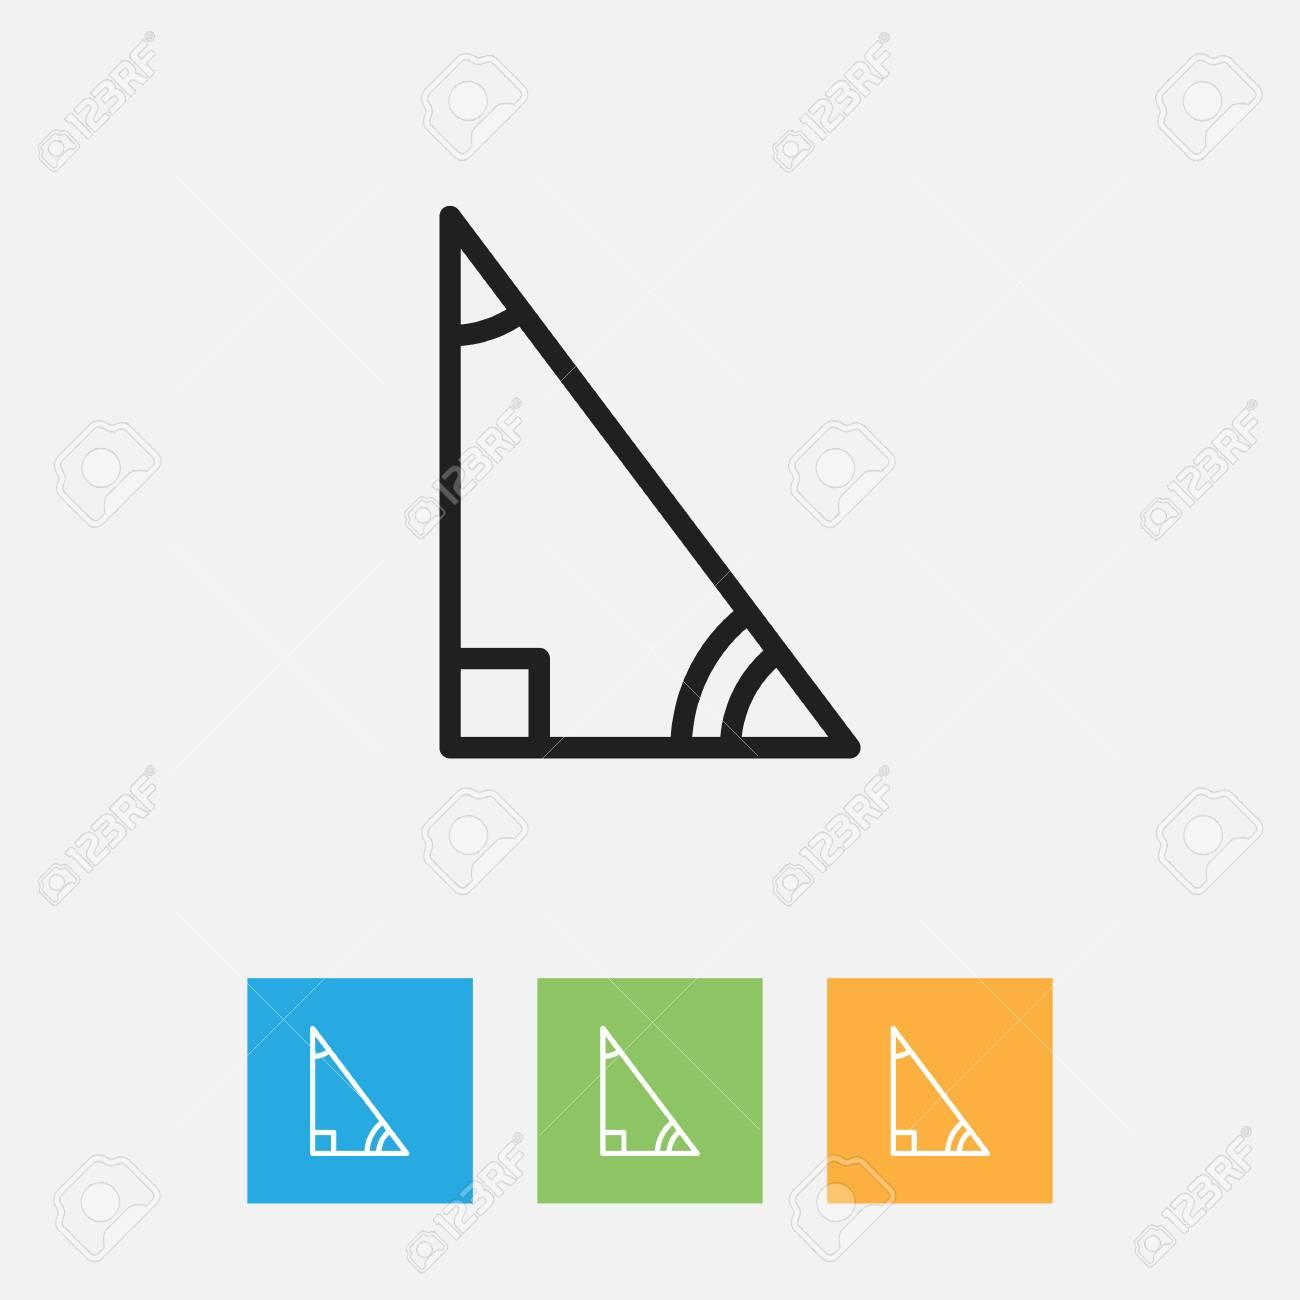 Vector Illustration Of Teach Symbol On Delta Outline Royalty Free